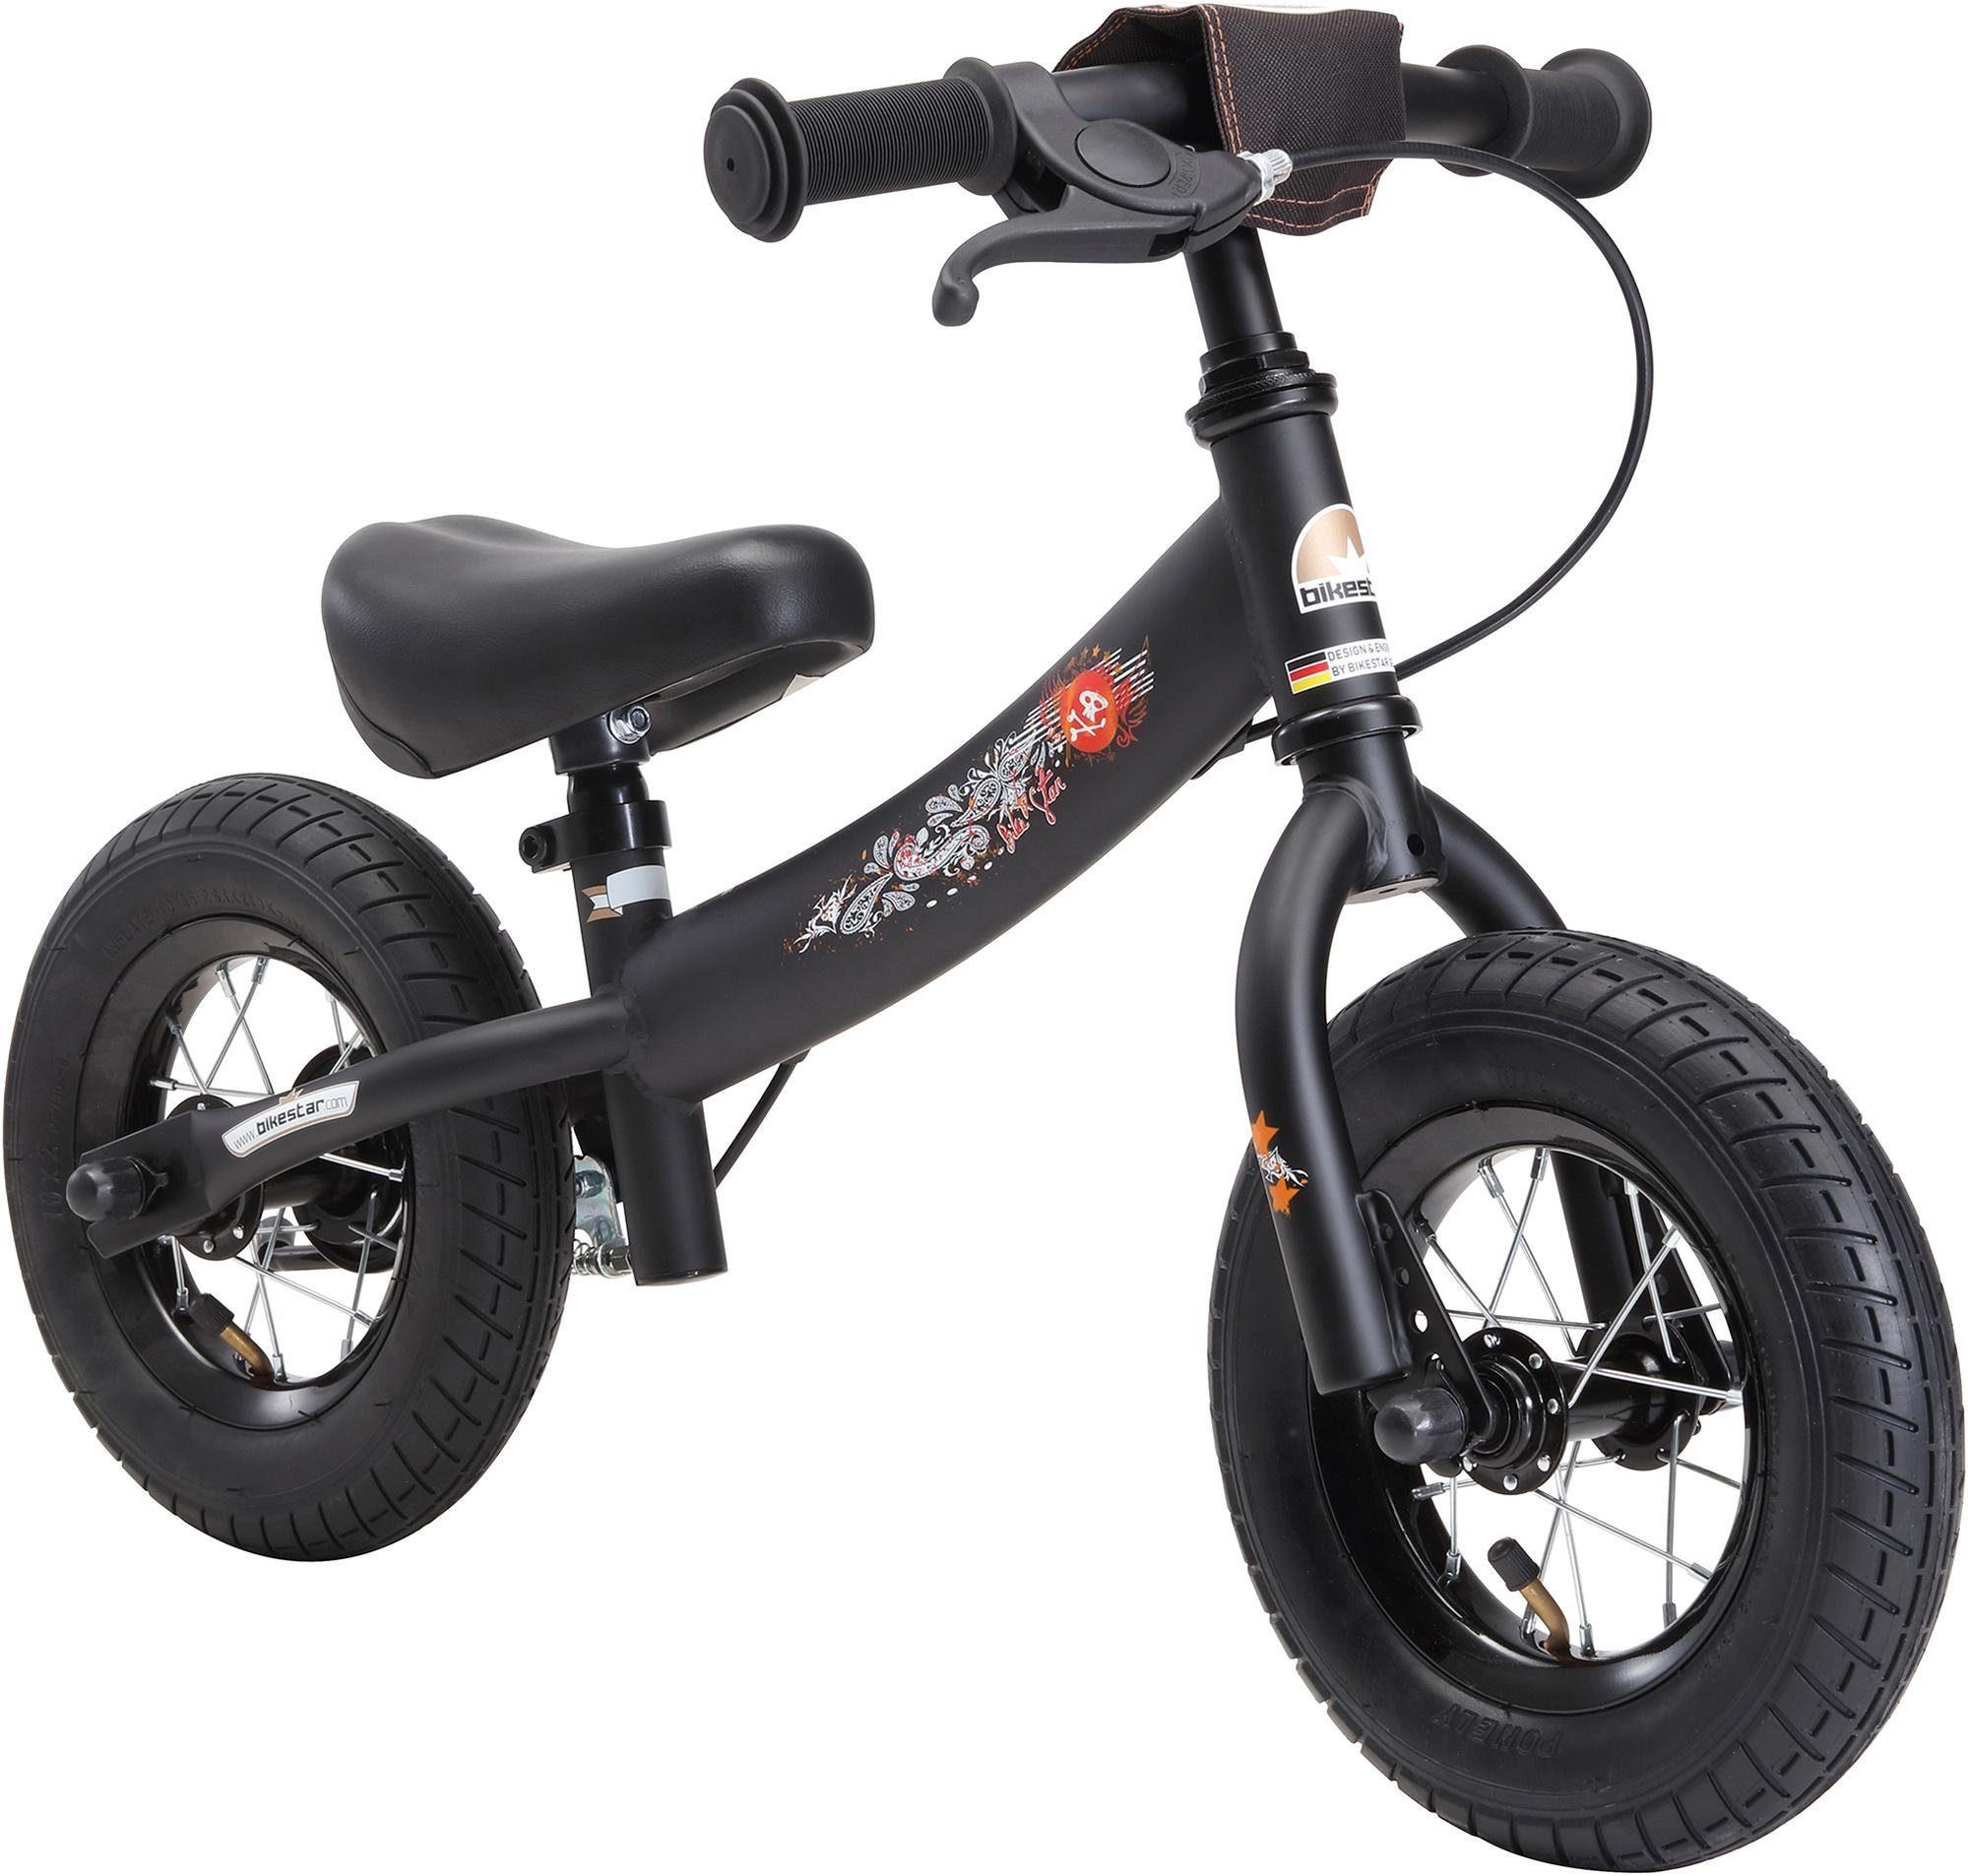 Bikestar Laufrad »Sport« 10 Zoll, mit Luftbereifung